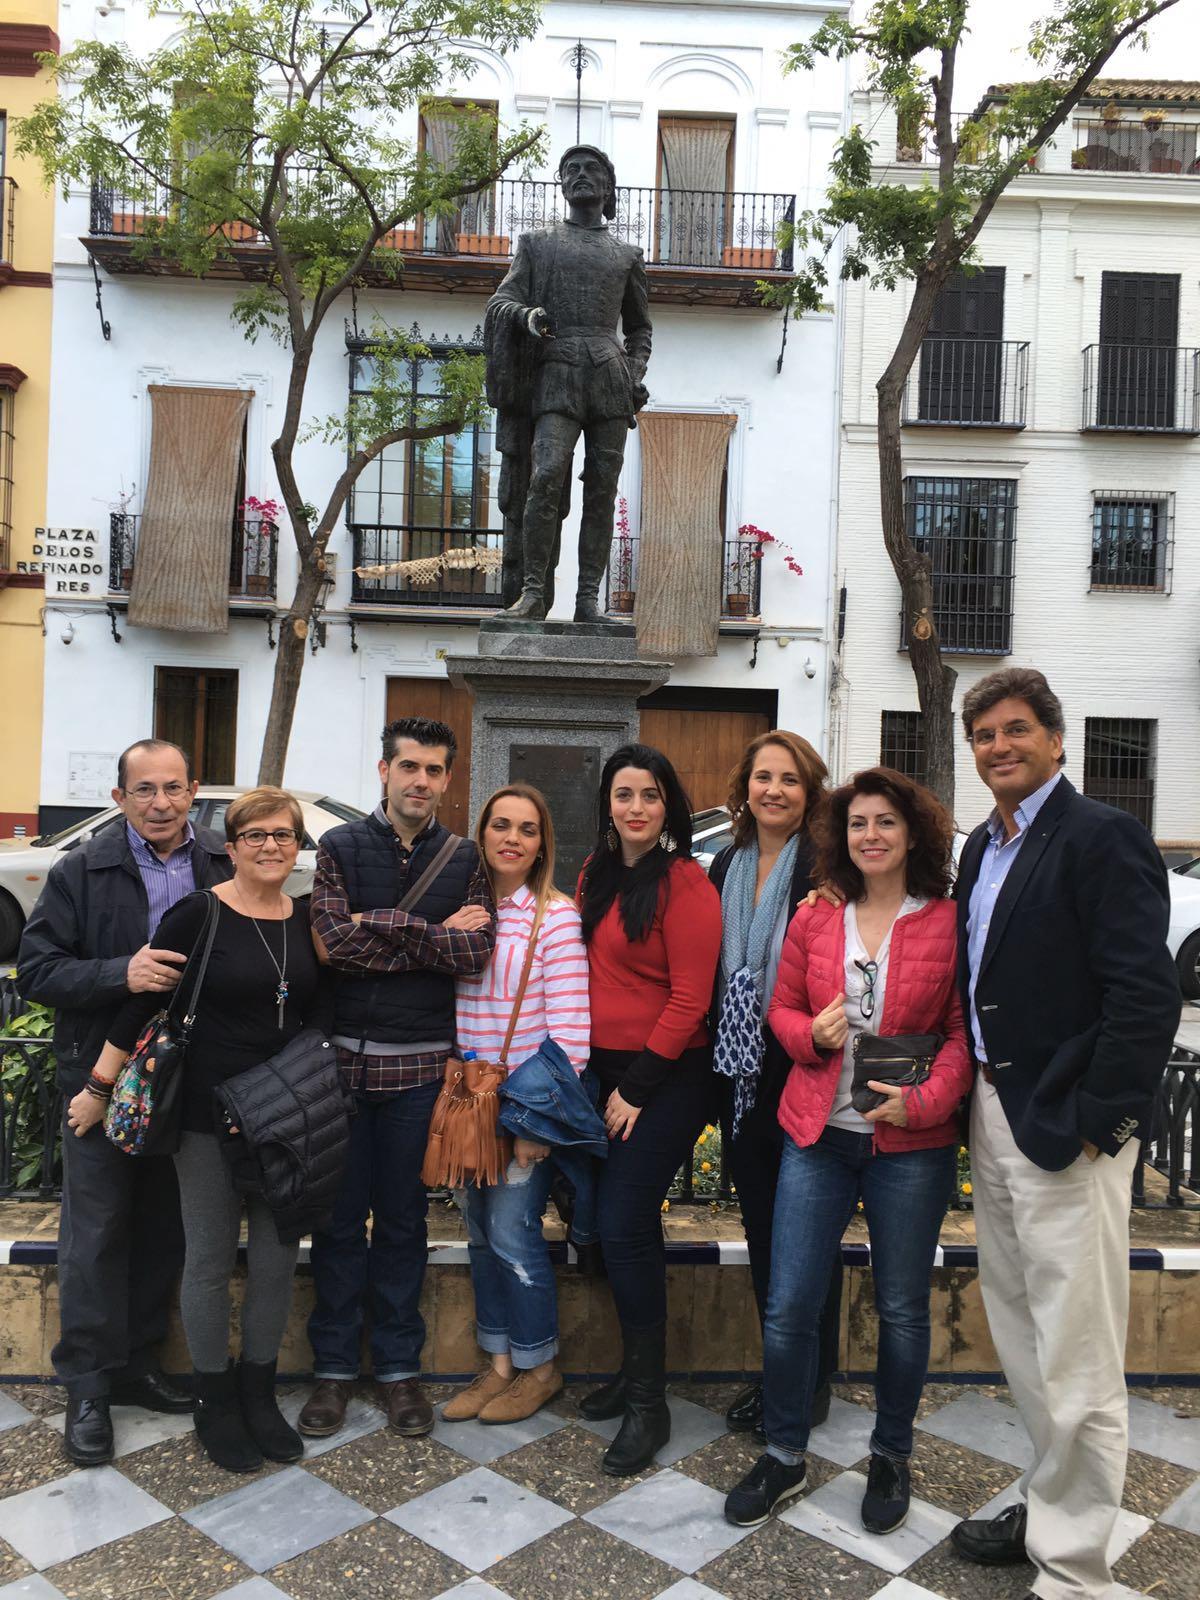 rutas Sevilla, conocer Sevilla, visitas guiadas Sevilla, experiencias culturales Sevilla, rutas, tours por Sevilla